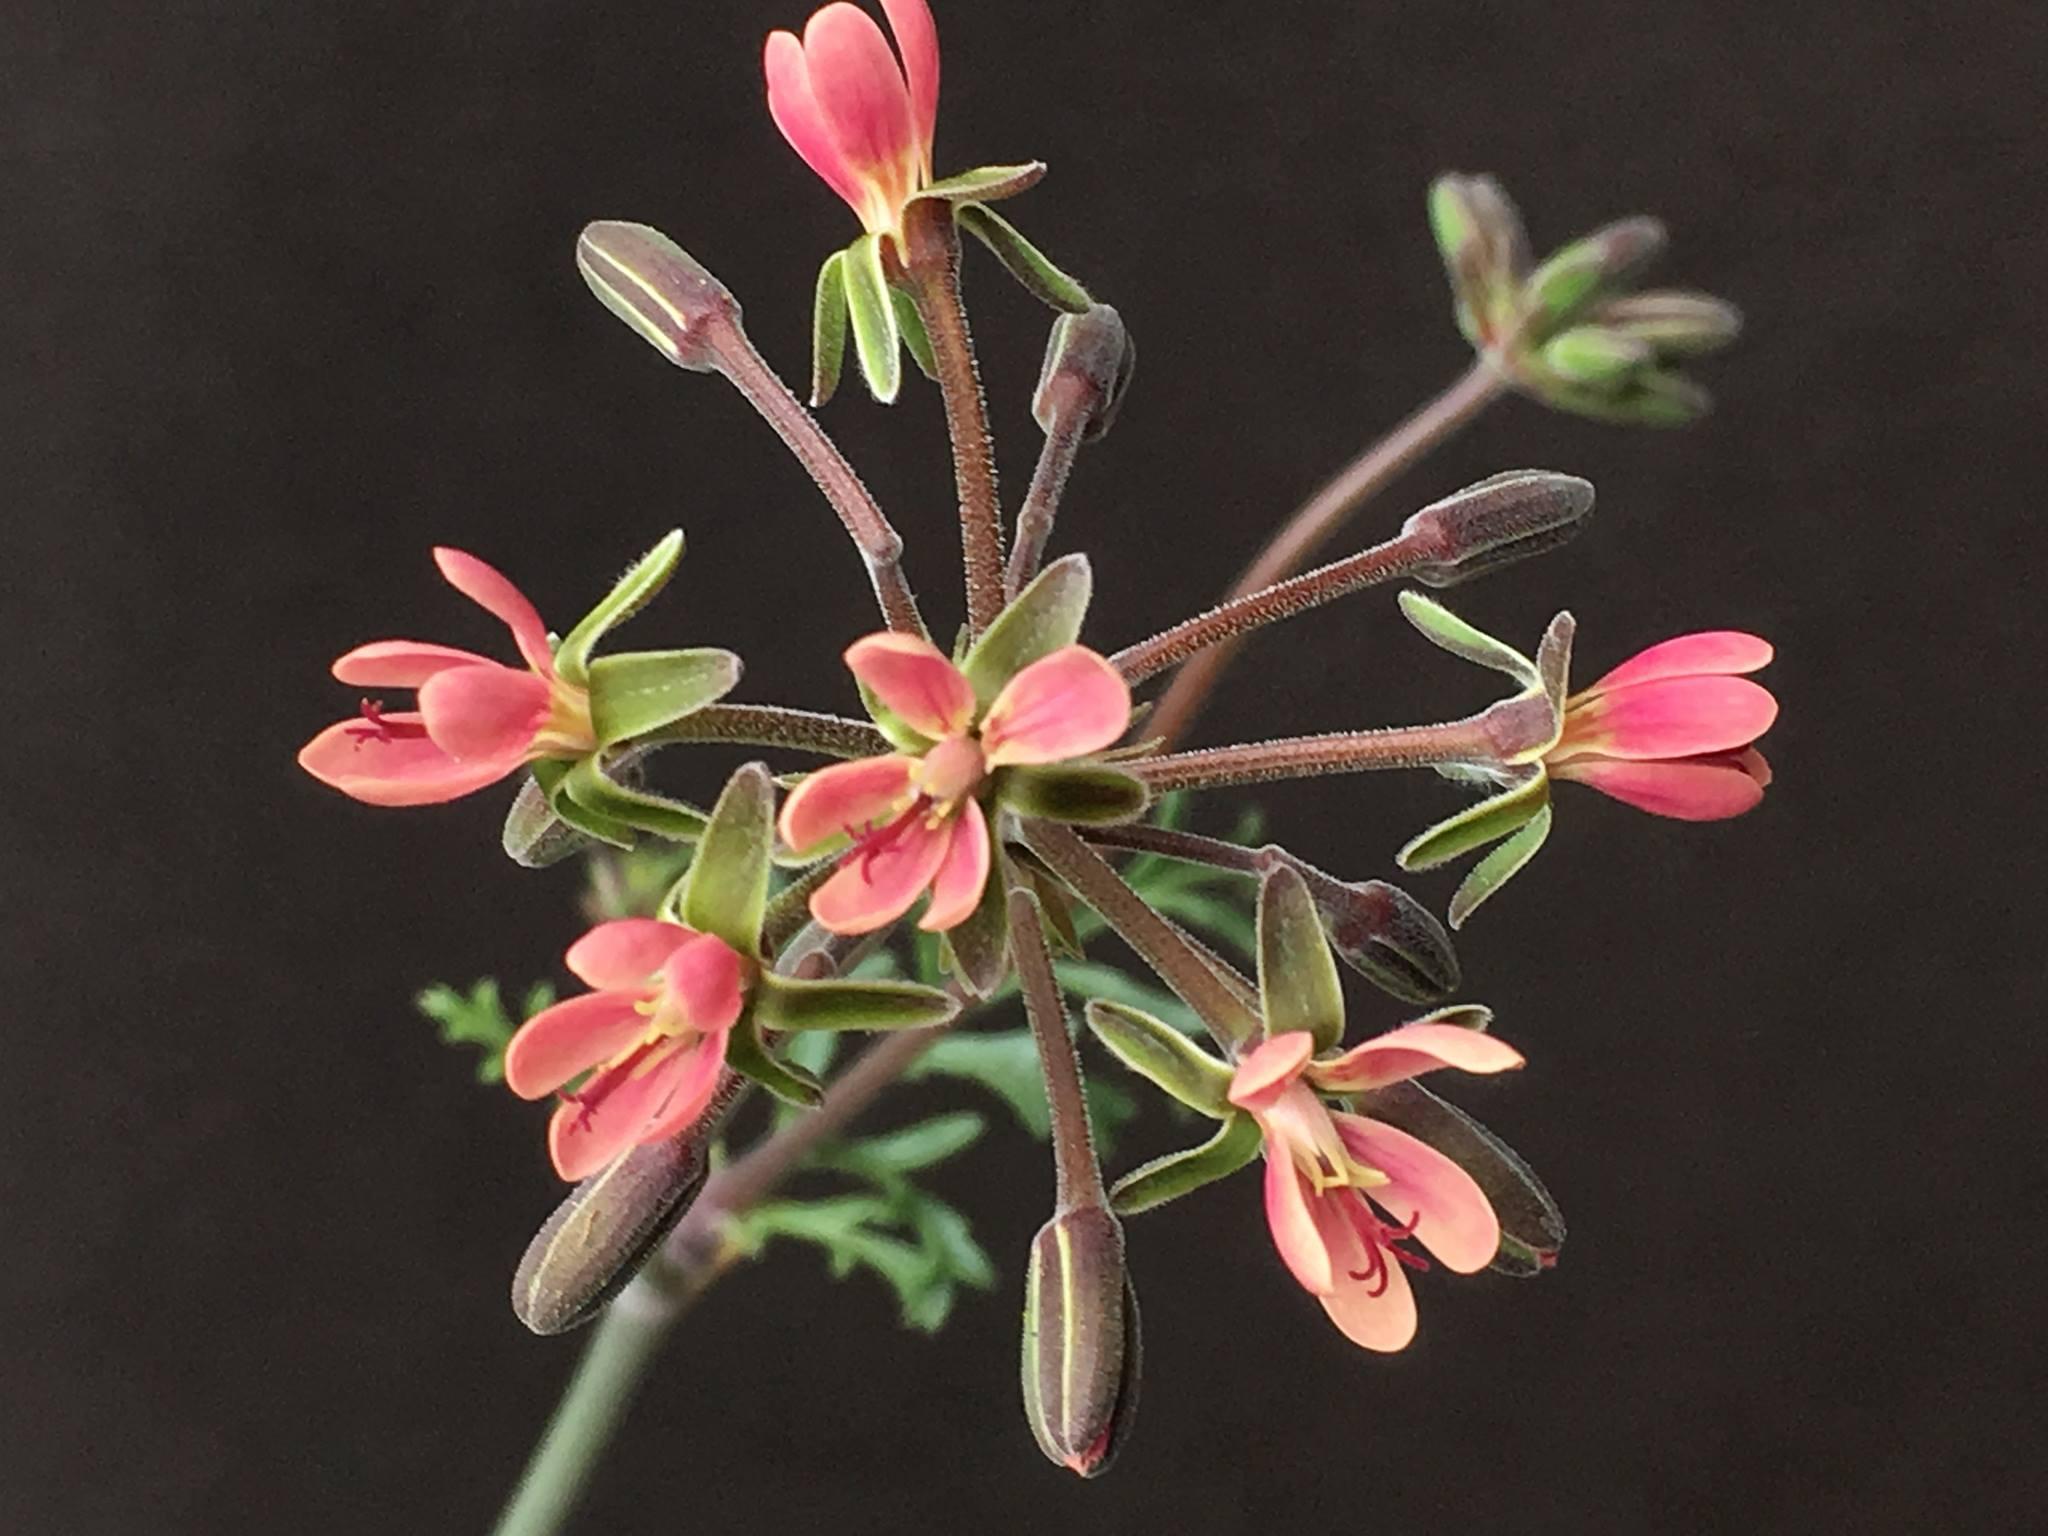 P gibbosum x anethifolium 3. Credit Arjan de Graaf.